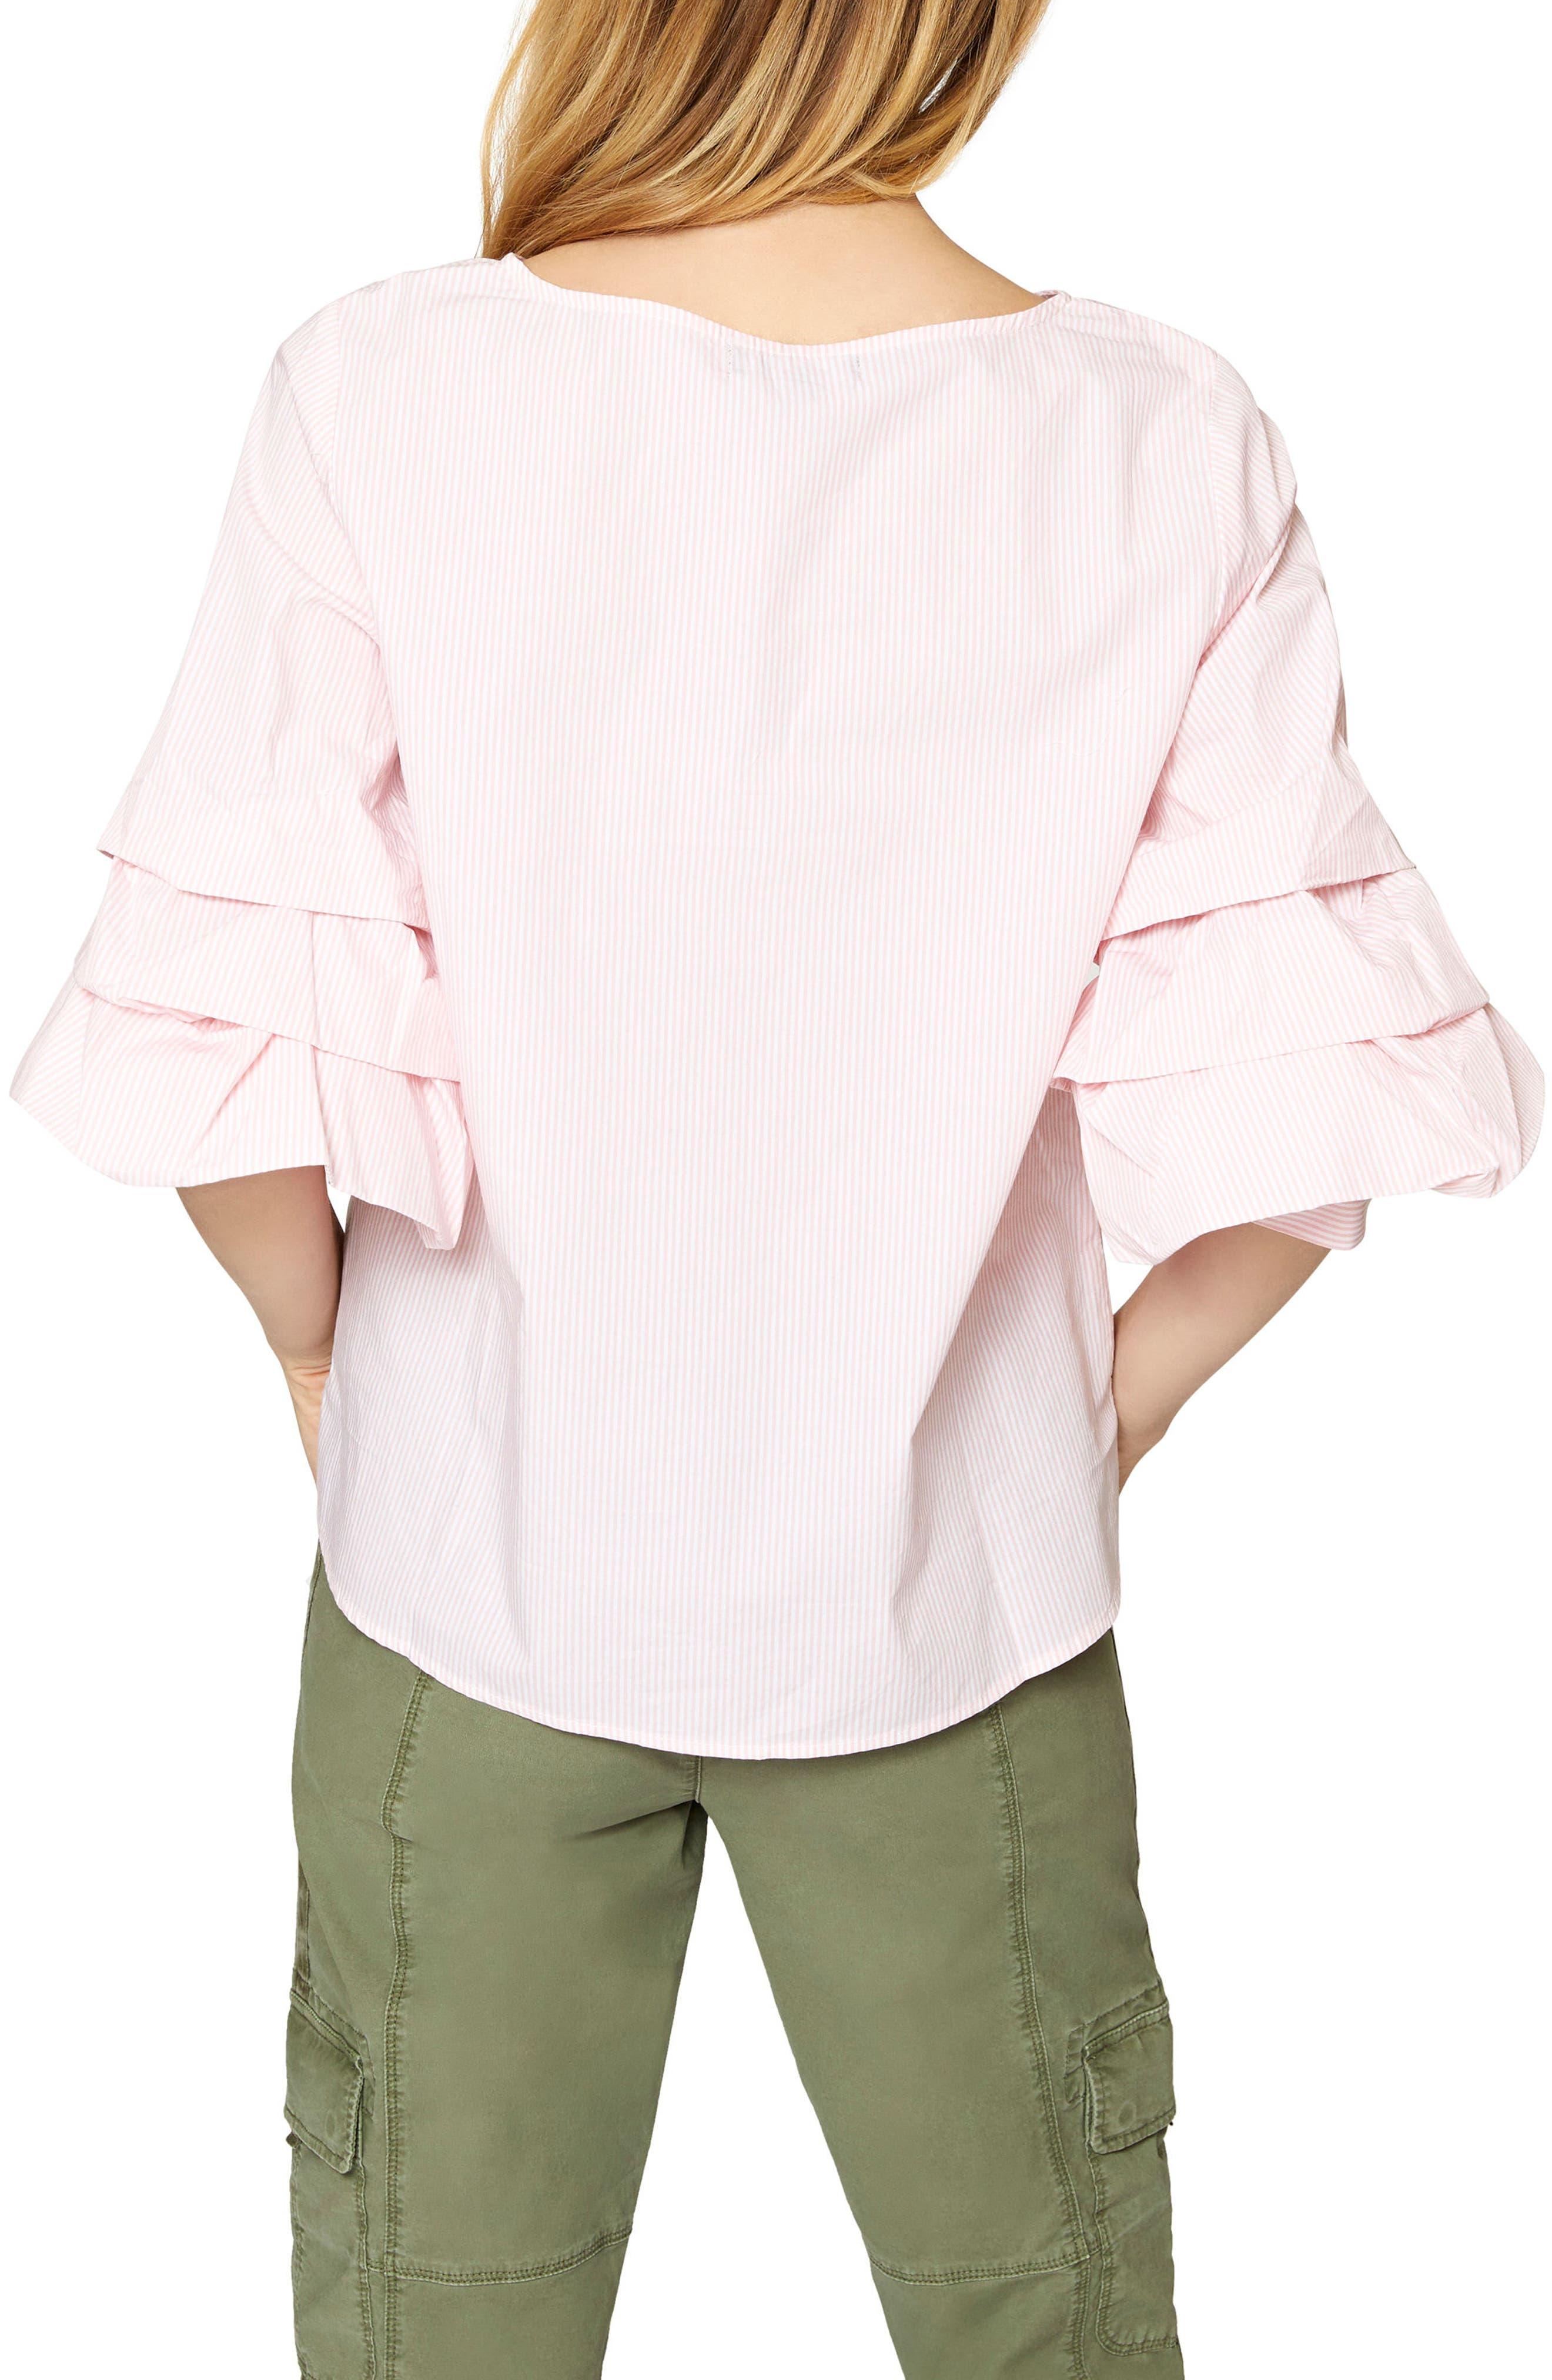 Delphine Tiered Sleeve Top,                             Alternate thumbnail 3, color,                             Flamingo Stripe